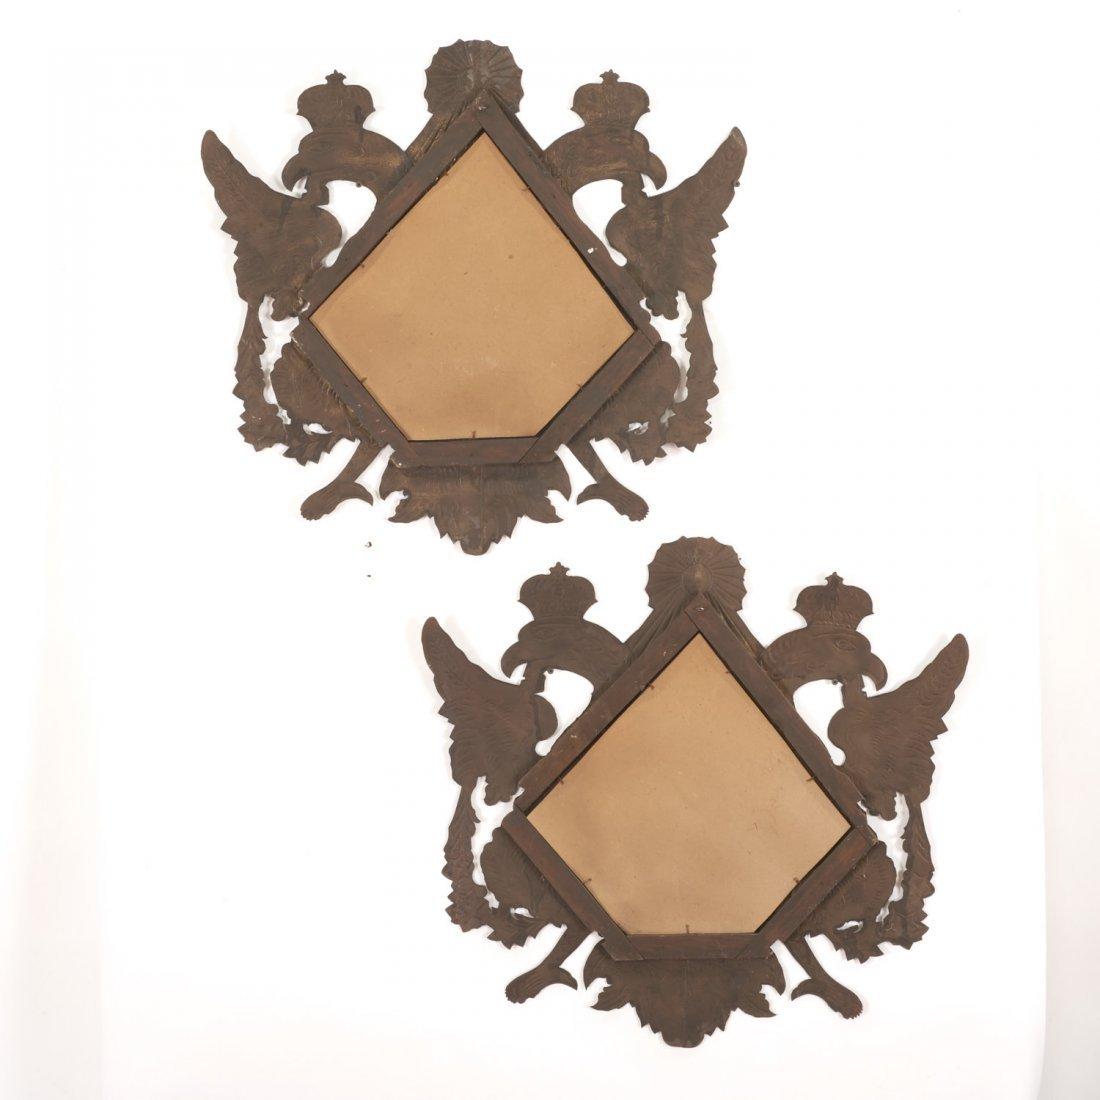 Pr Spanish Colonial style gilt metal wall mirrors - 9